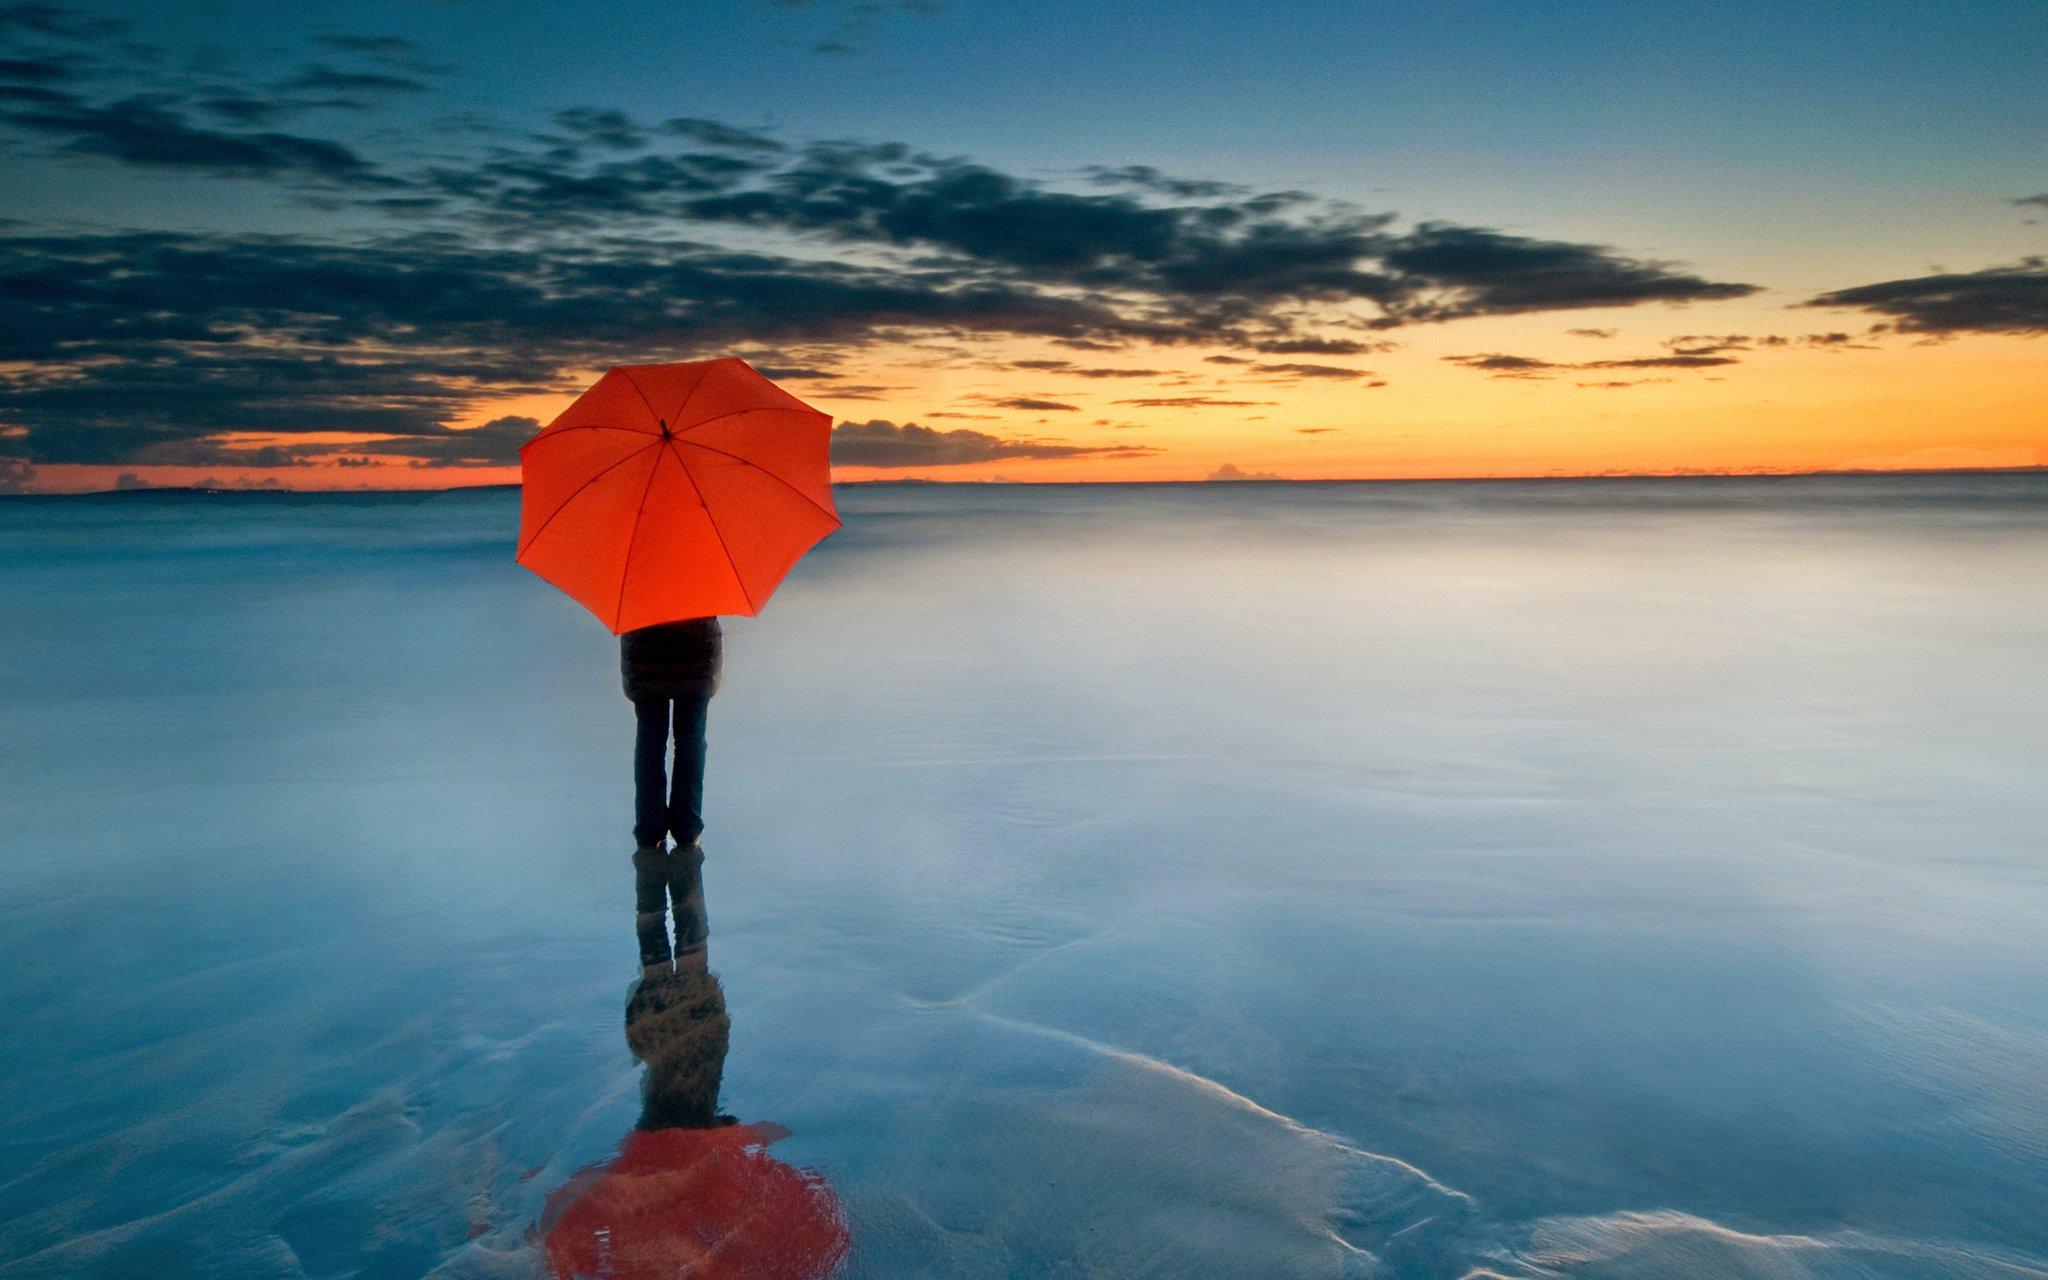 решил картинки одиночества сердец супер